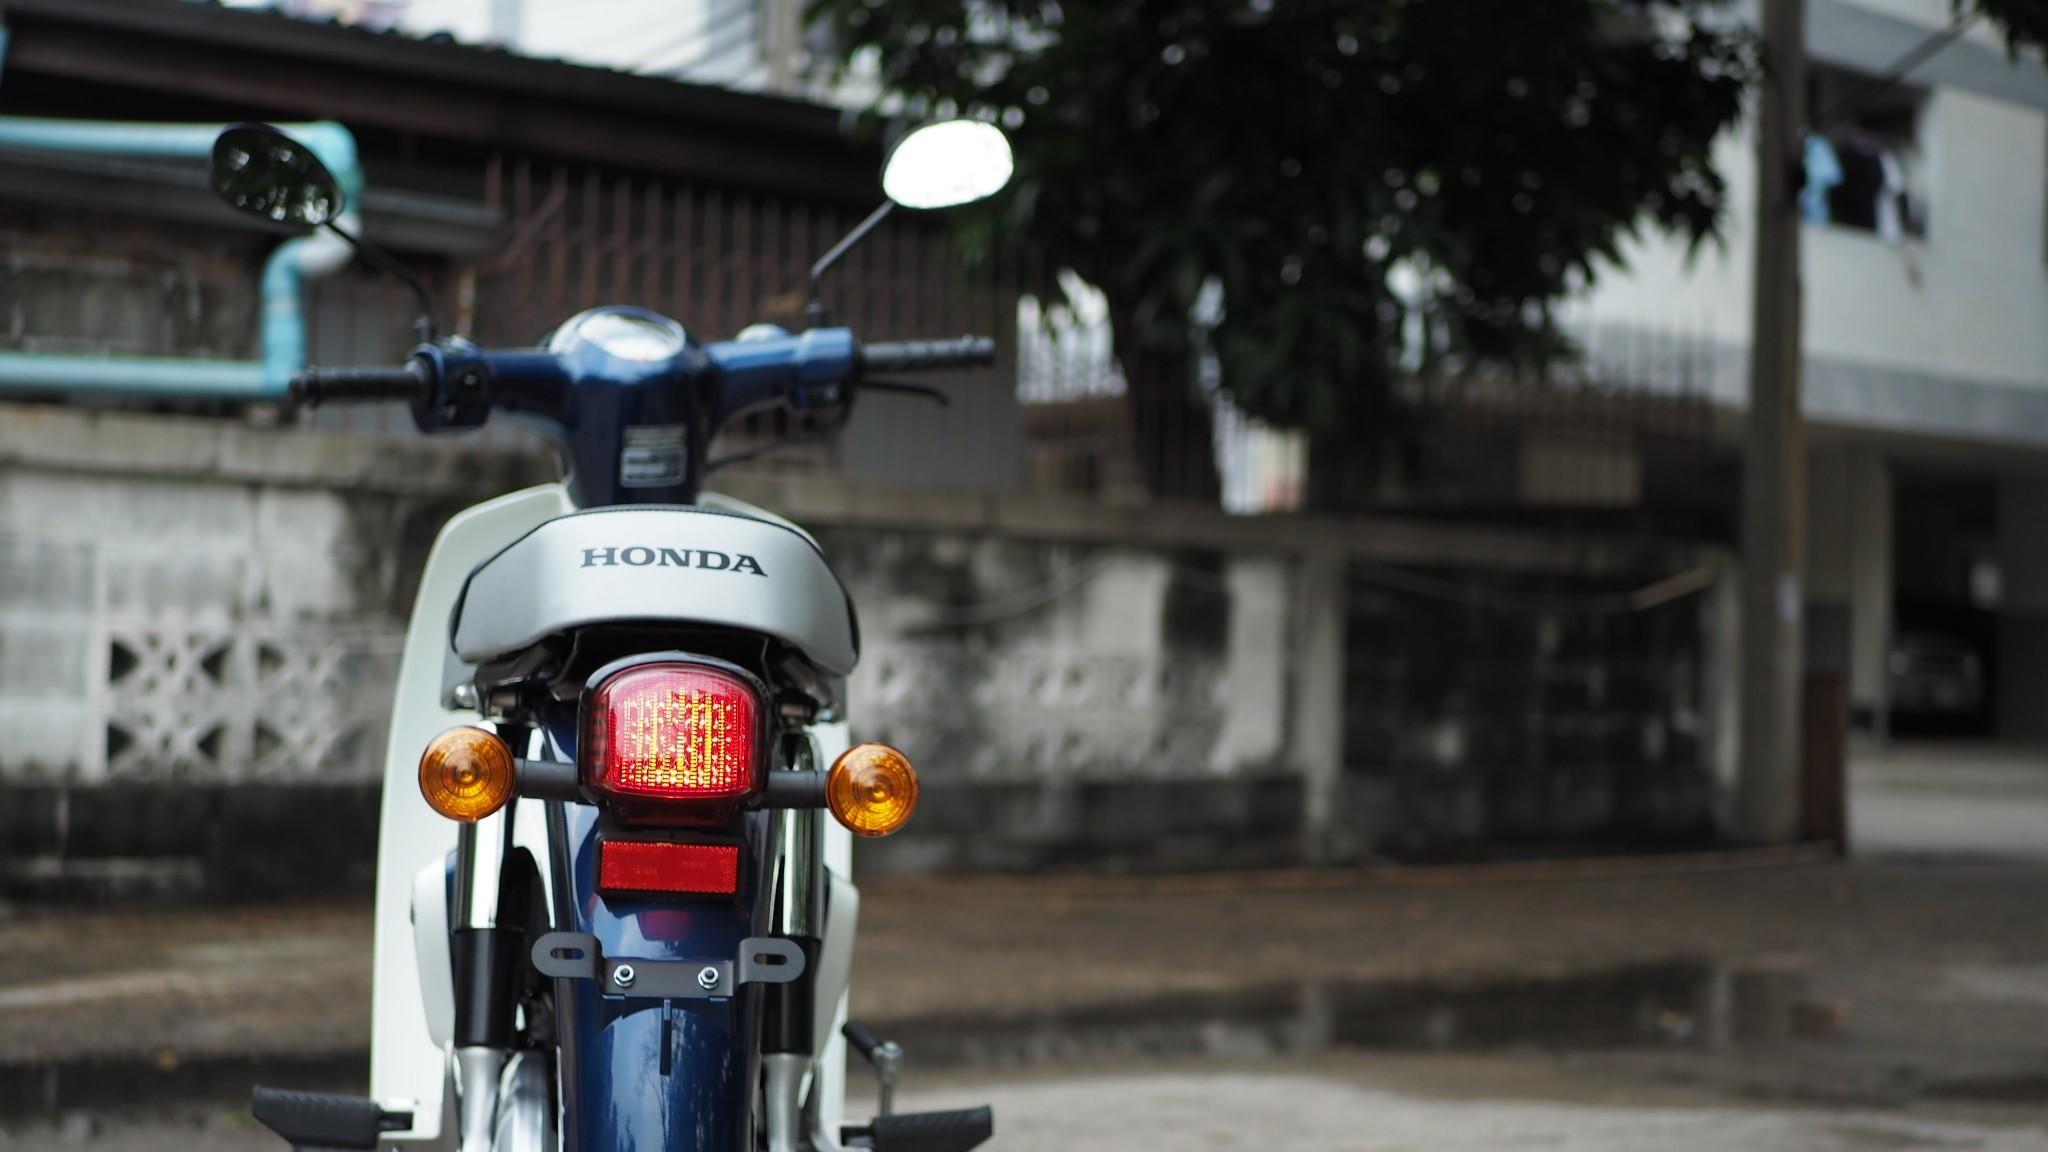 Honda-Motorcycle-มอเตอร์ไซค์-ฮอนด้า-รีวิว-review-honda-super-cub-2018-just-ride-it